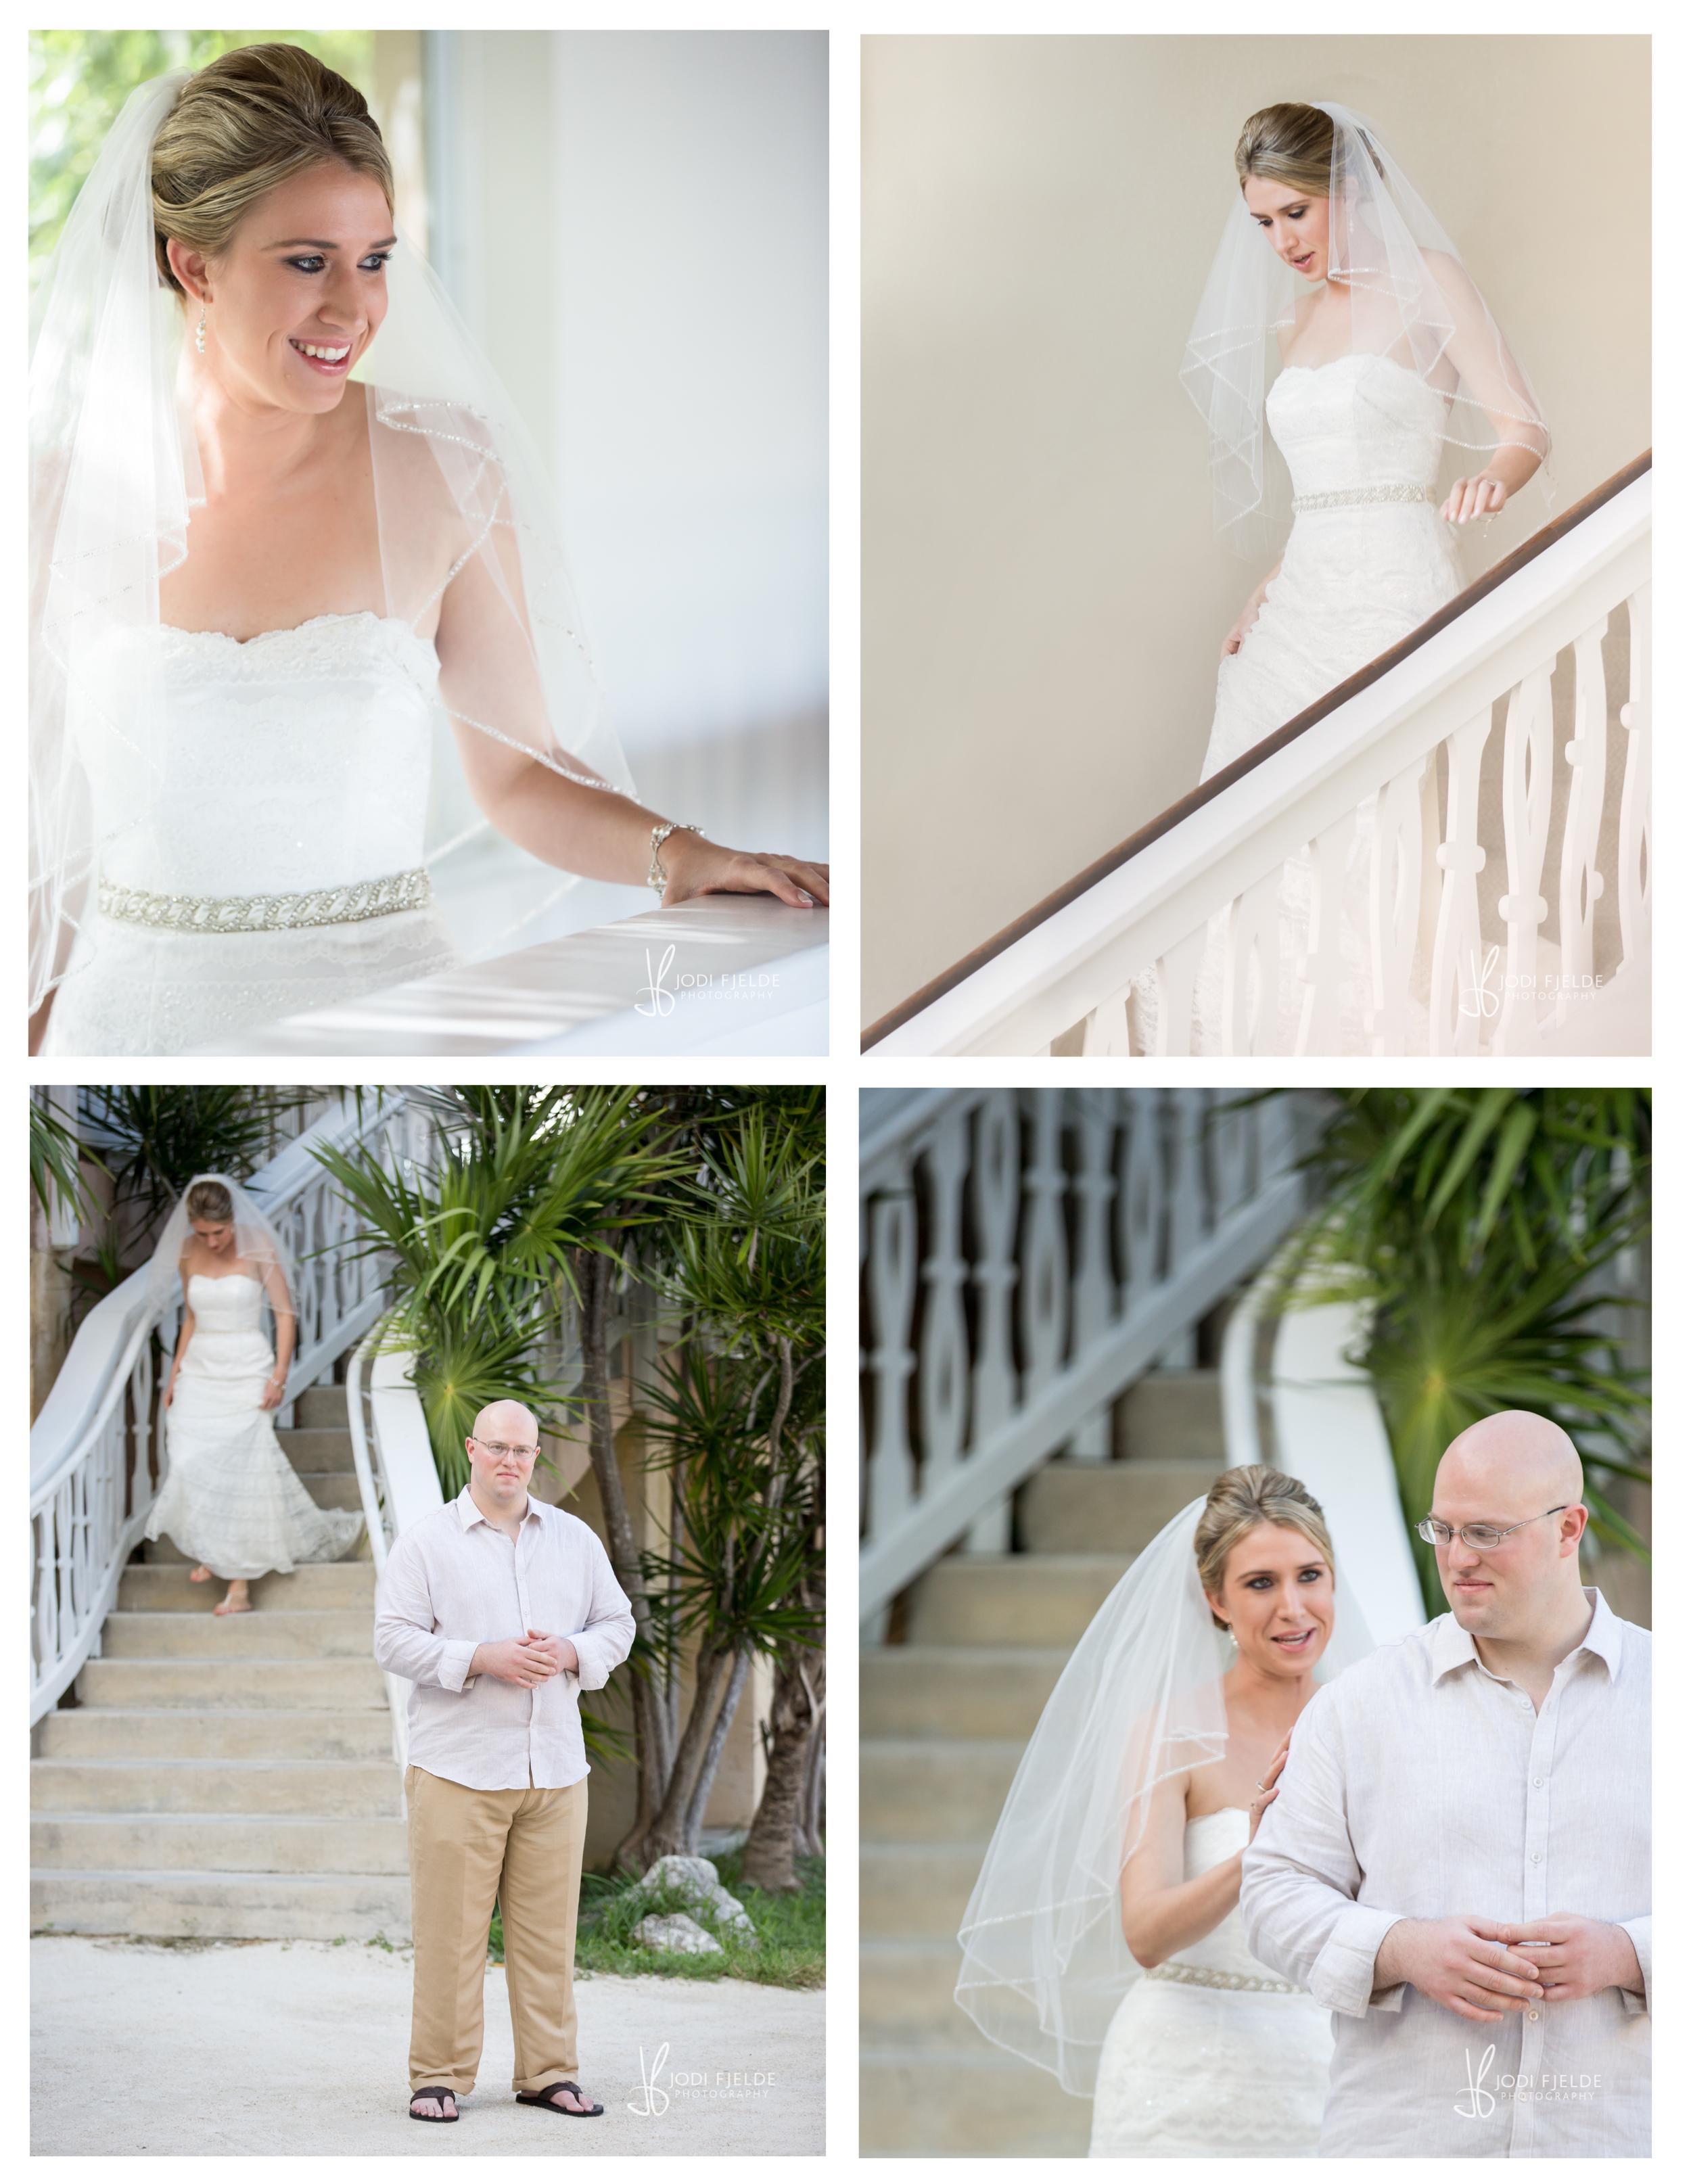 Cocconut_Cove_&_ Marina_ wedding_Kayla_and_Patrick 6.jpg